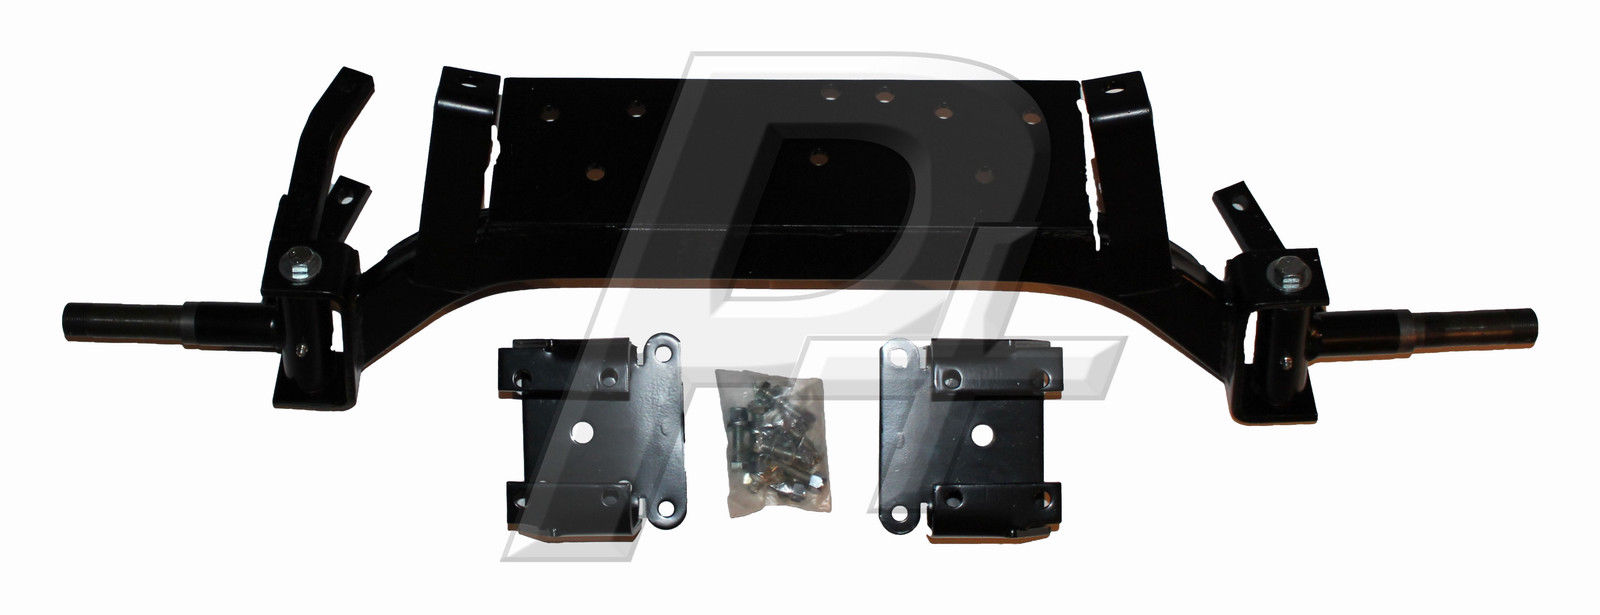 Electric Lift Kits : Ezgo golf cart quot drop axle lift kit up electric